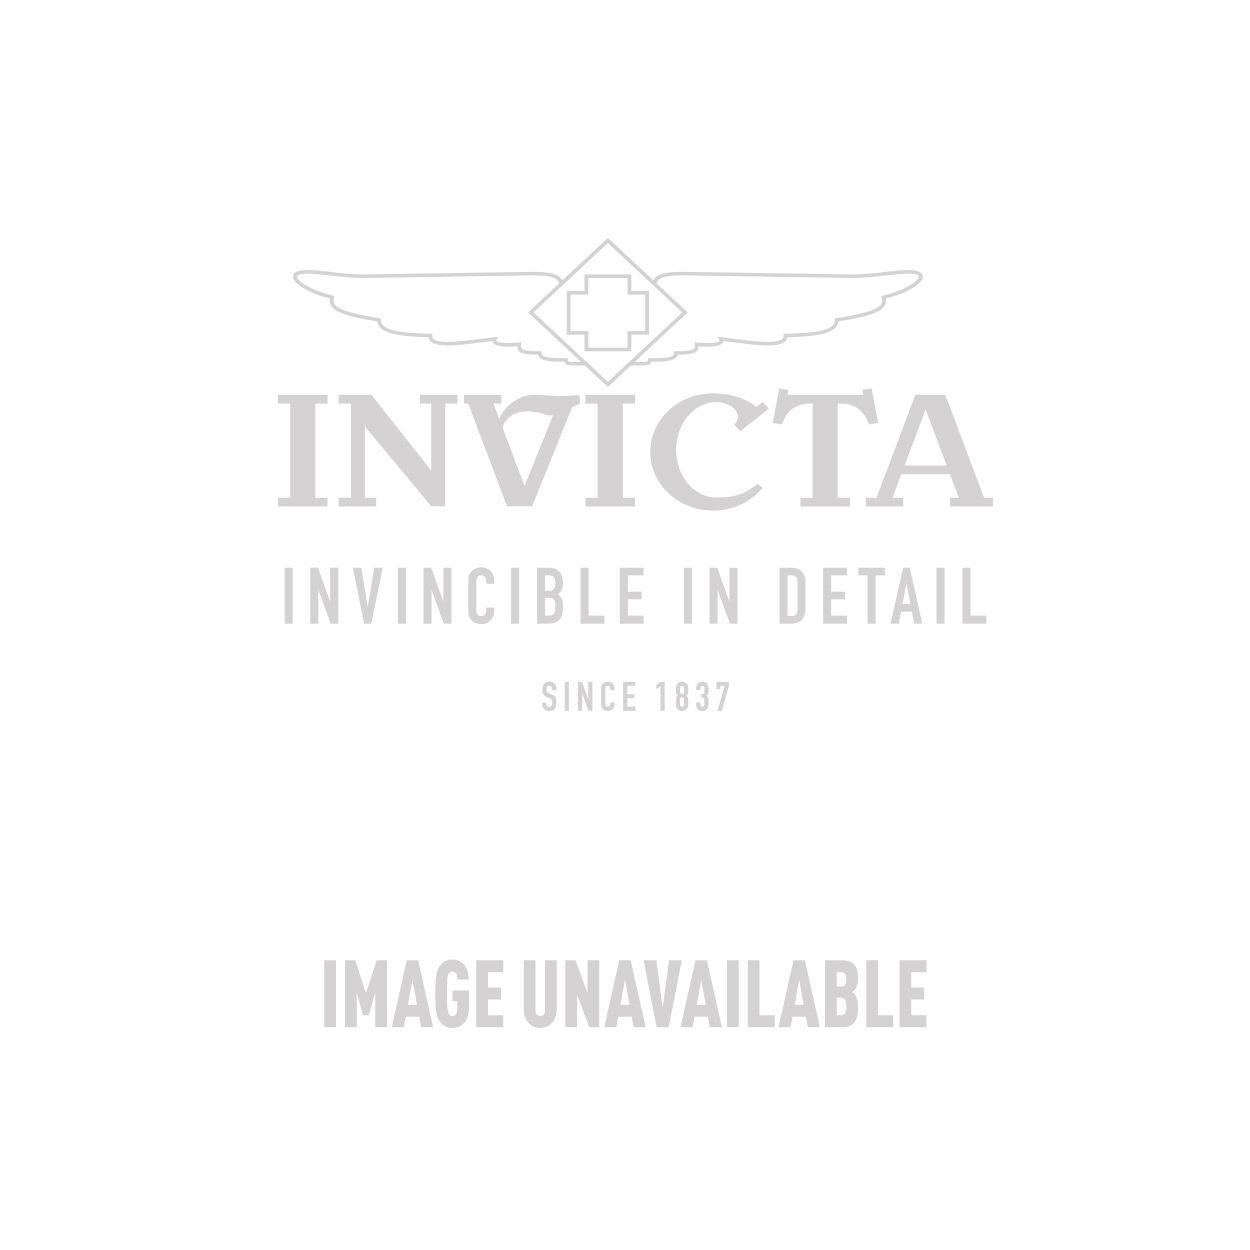 Invicta Corduba Swiss Made Quartz Watch - Black, Gunmetal case with Black tone Polyurethane band - Model 90228